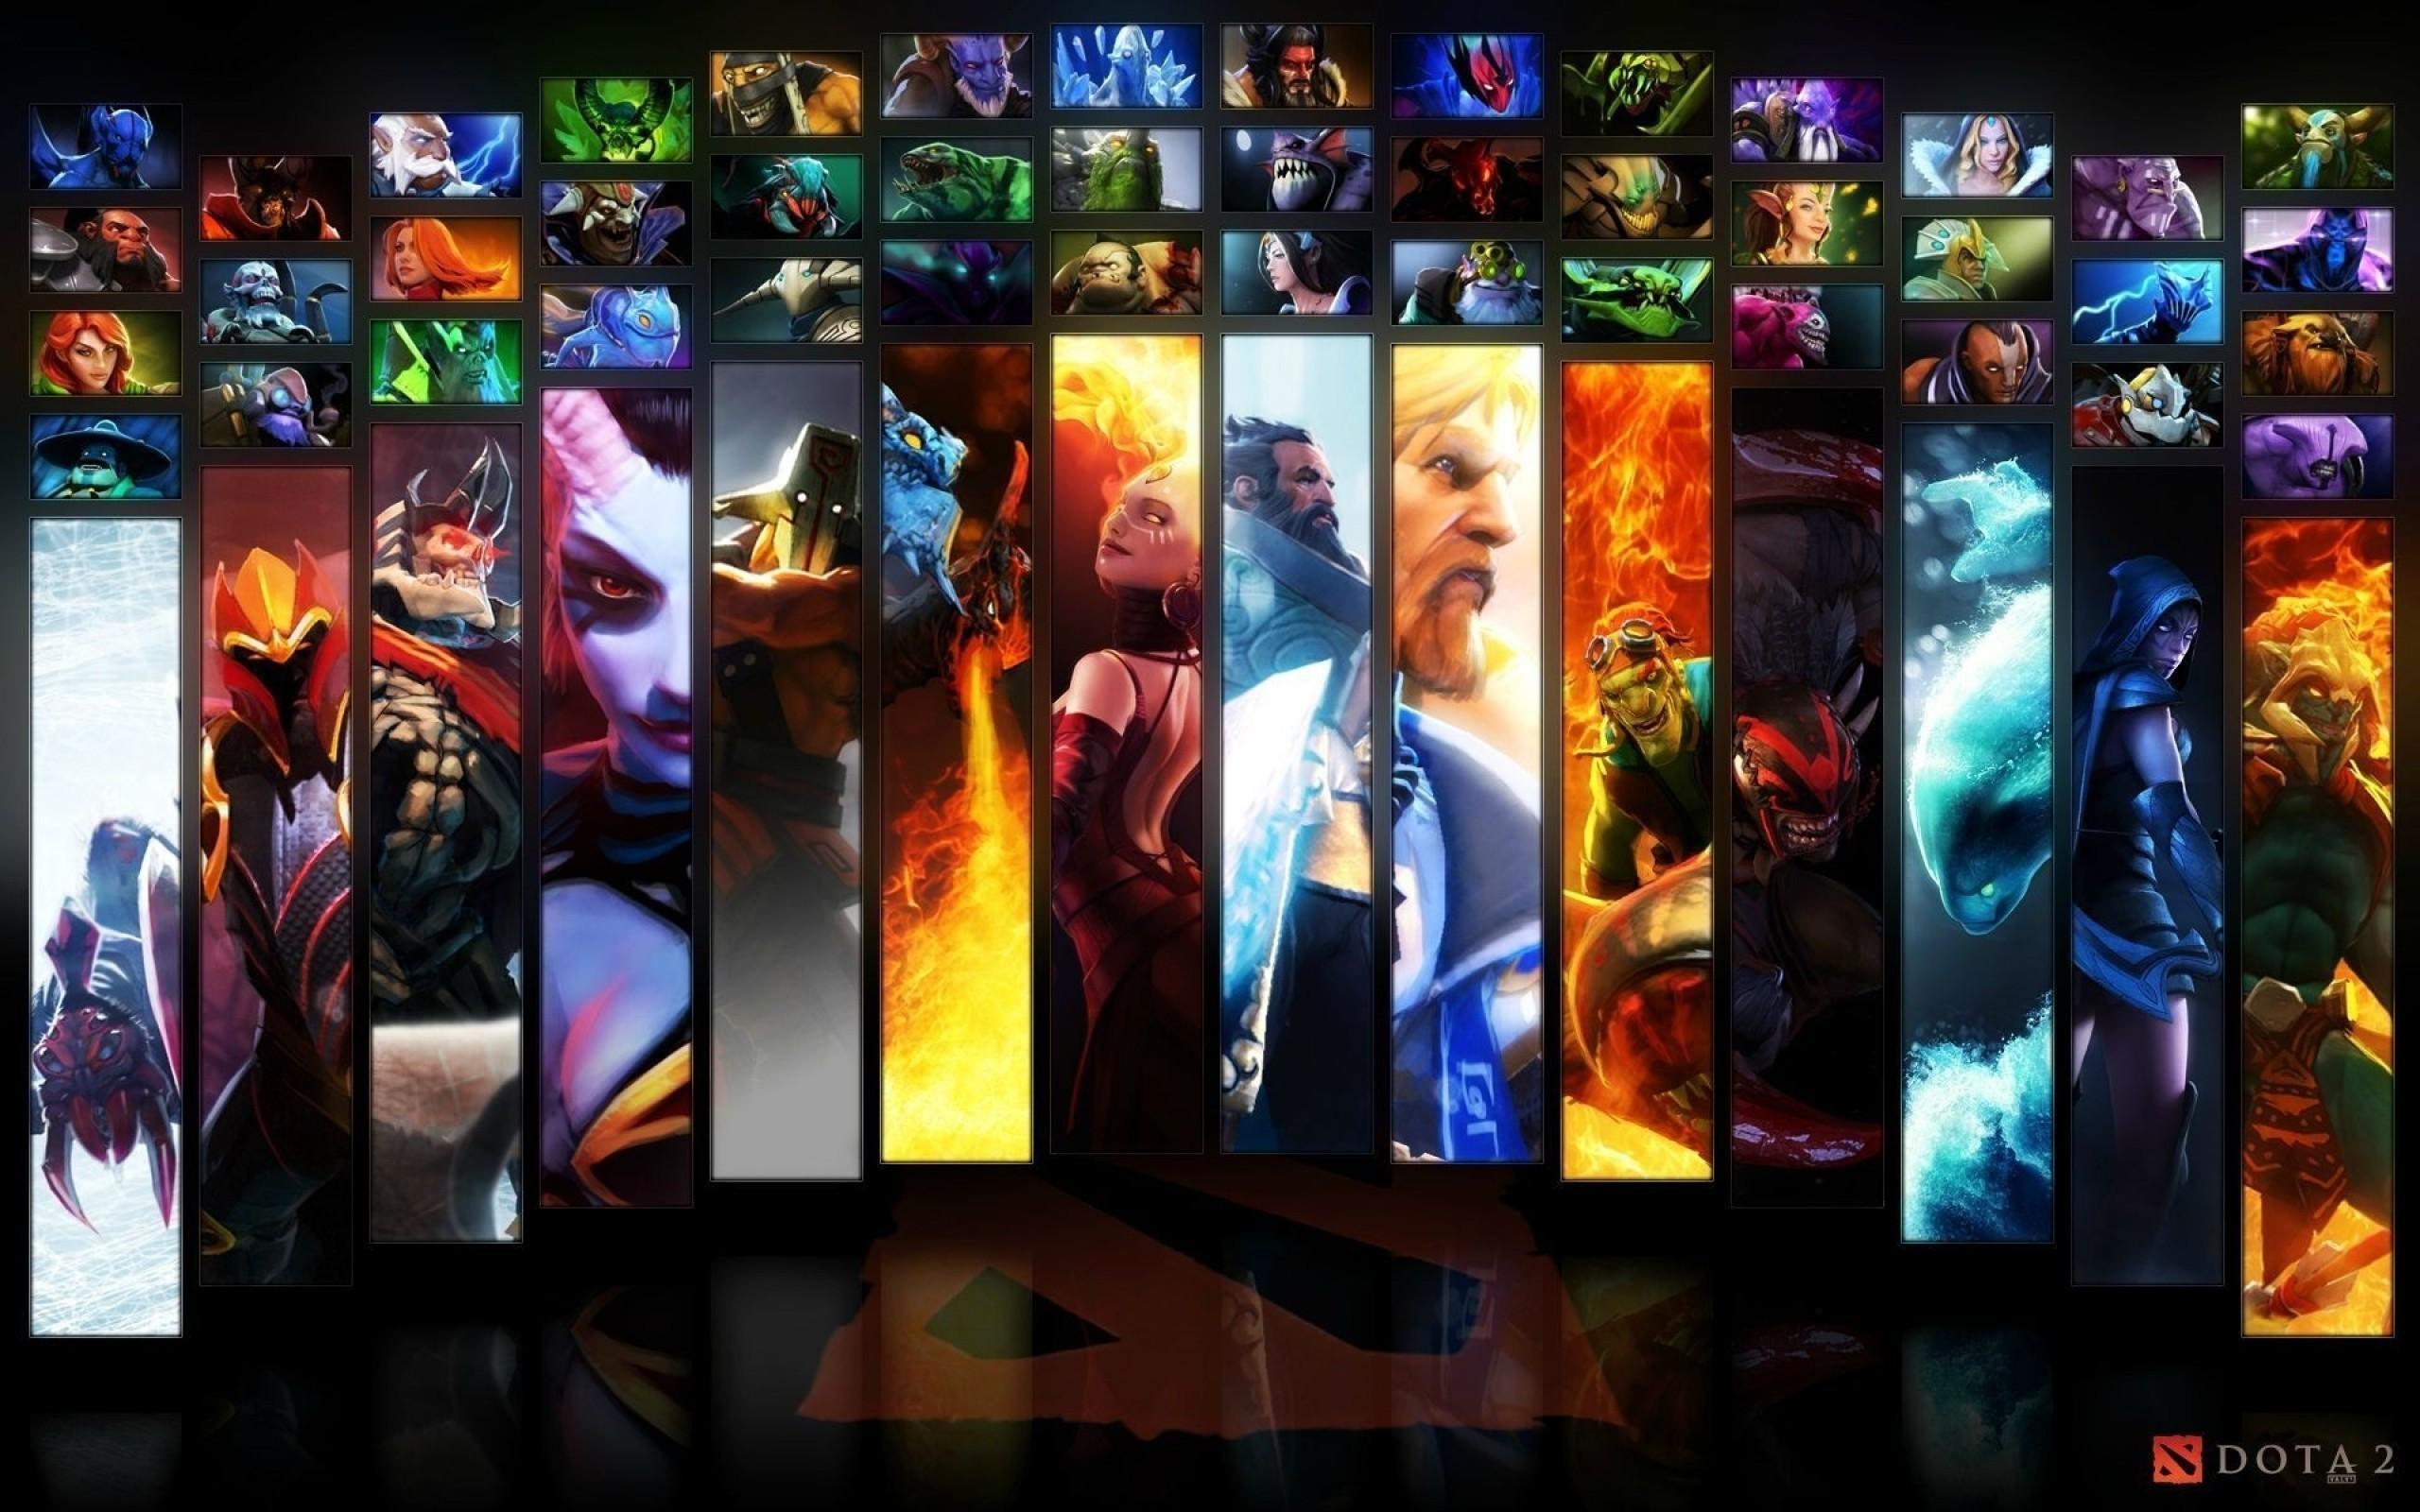 Video games heroes dota dota 2 Wallpaper   HD Desktop Wallpapers